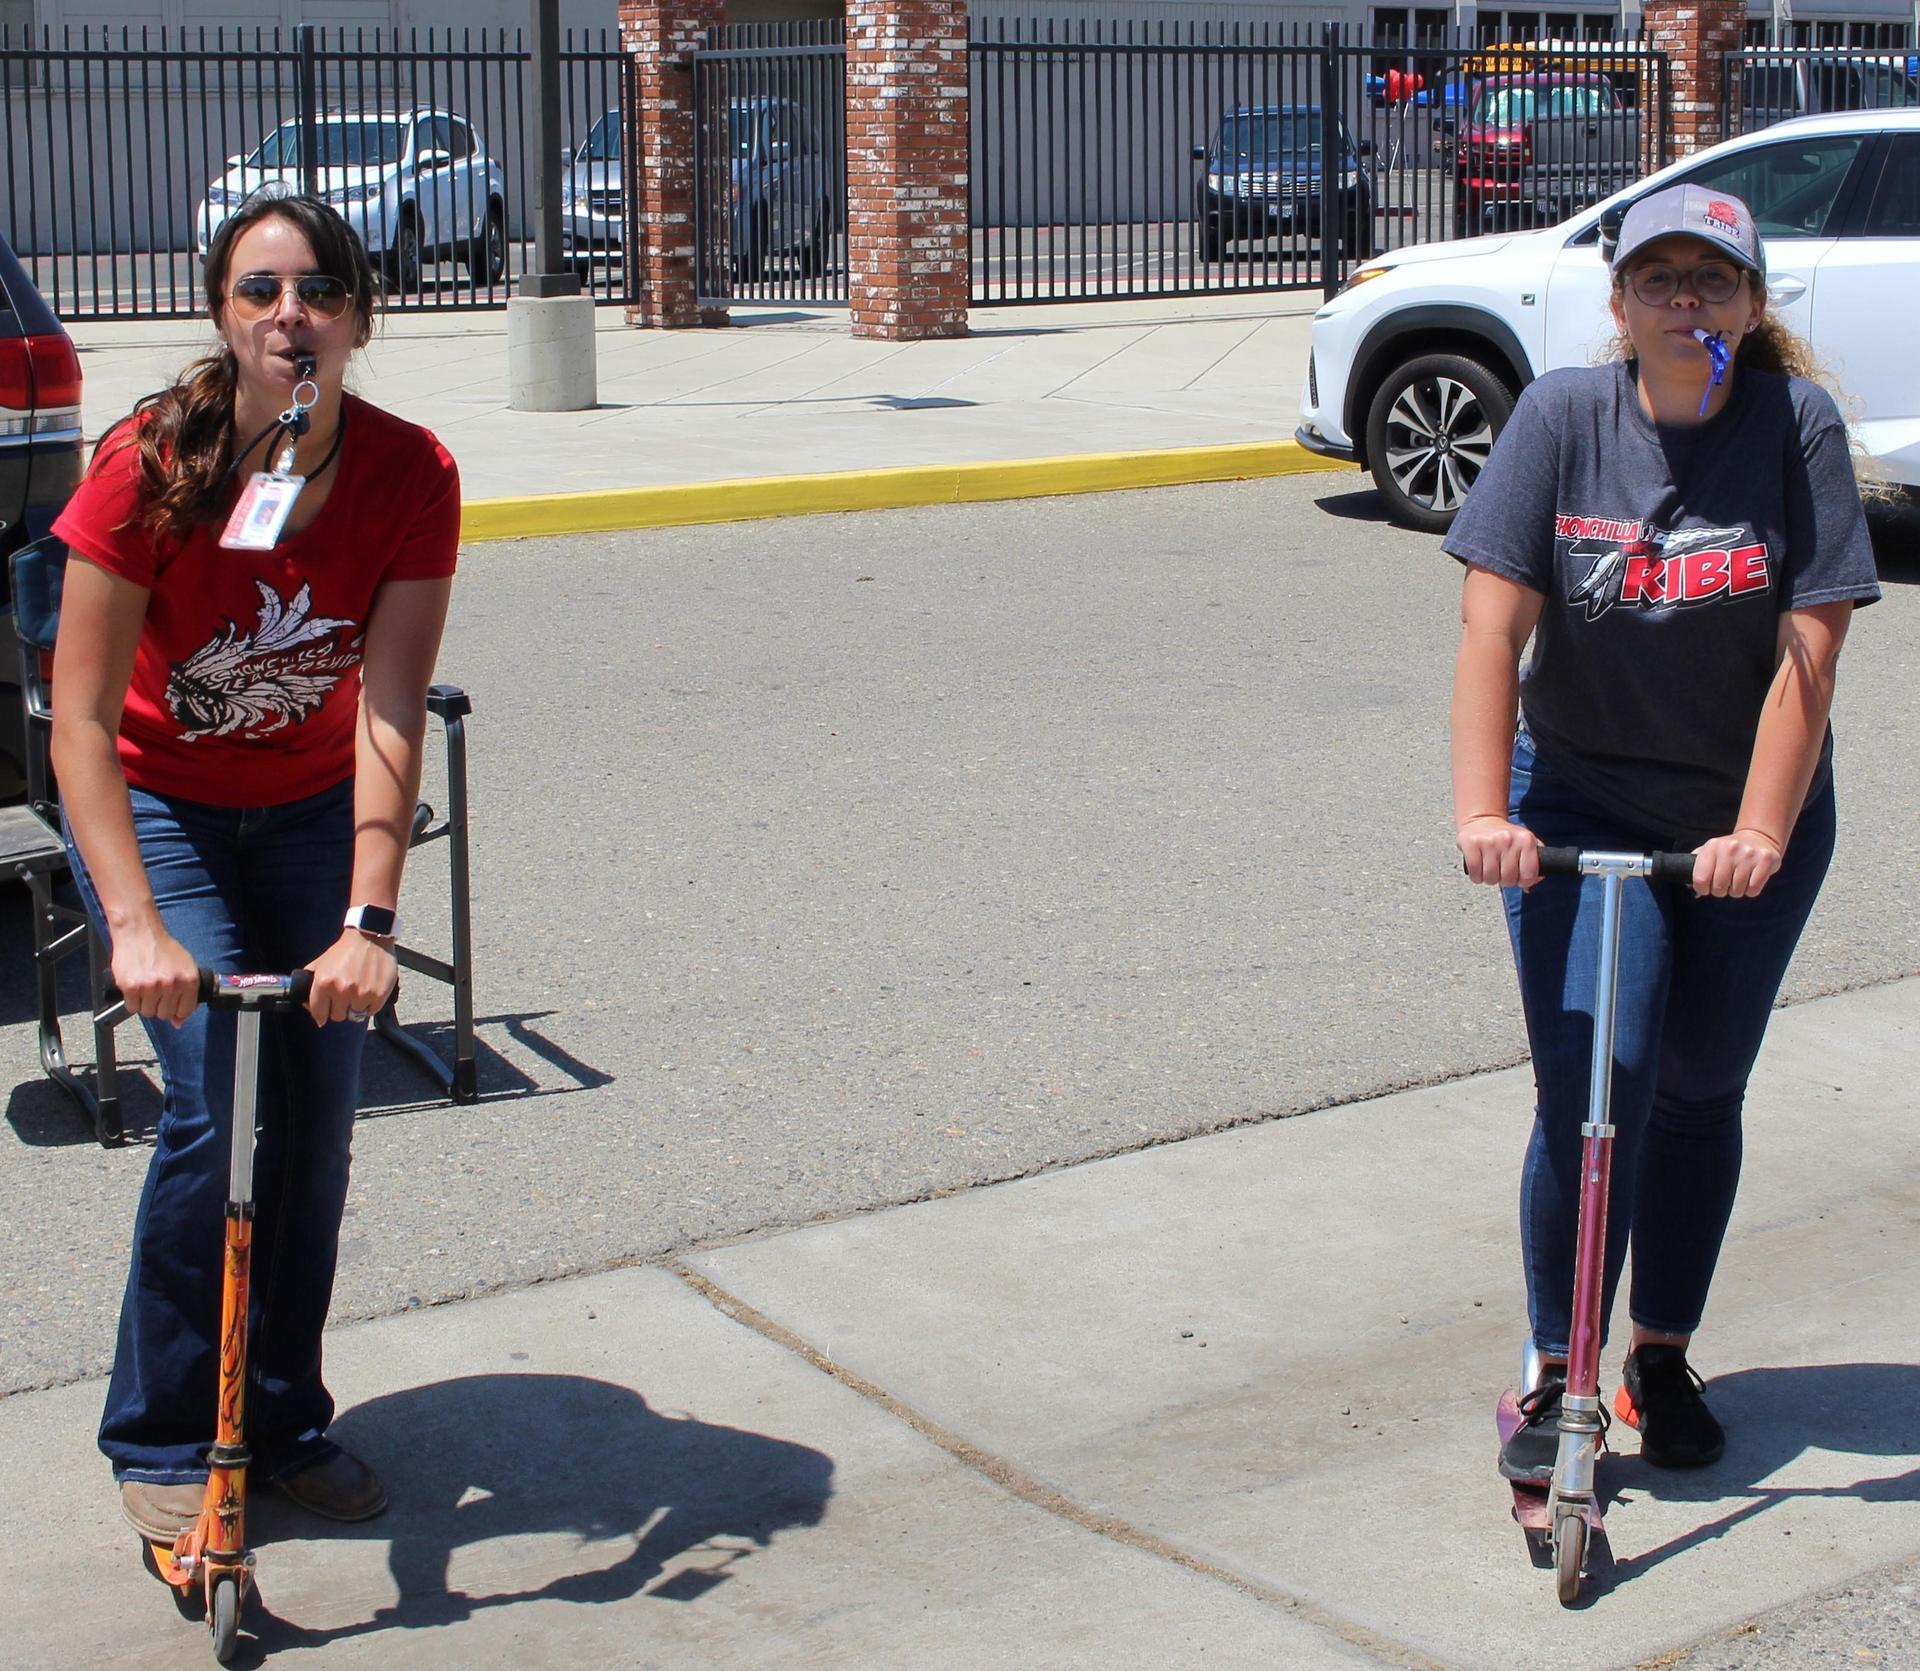 Teachers' Shane Raggio and Savannah Linhares on their scooters